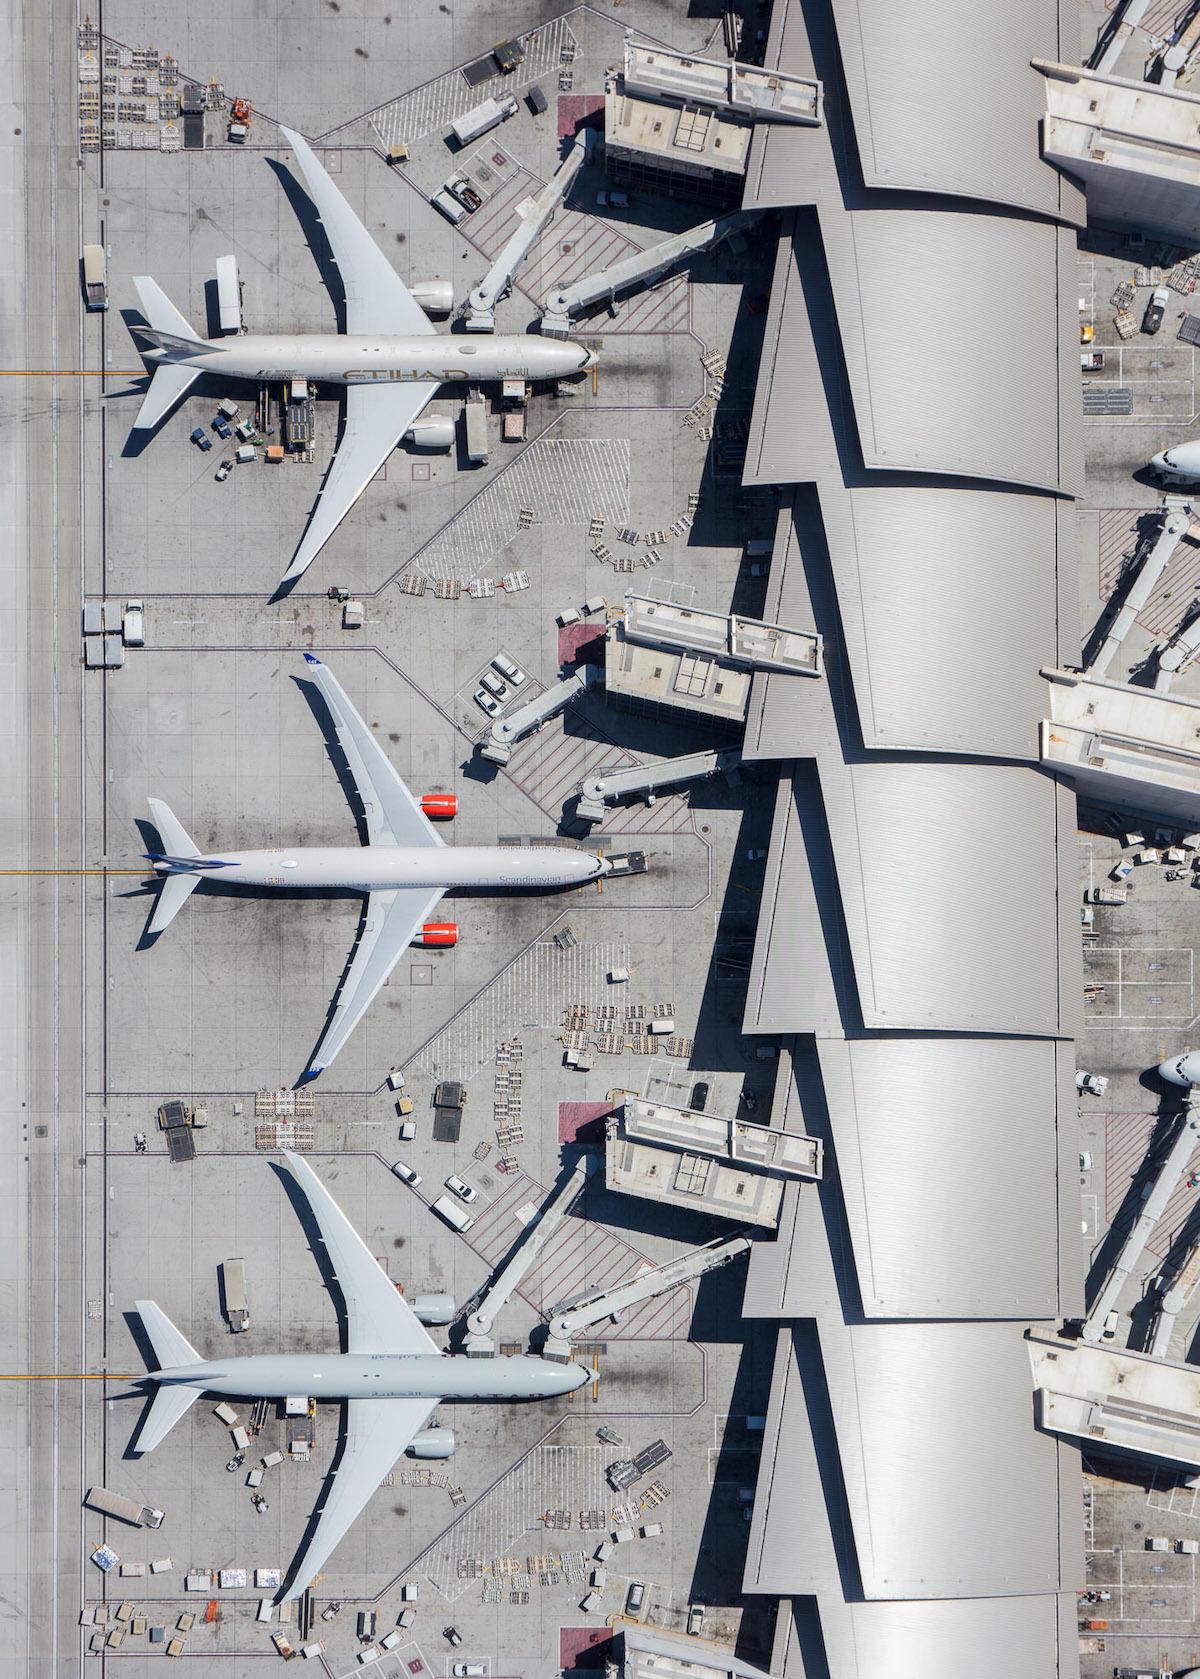 planes on tarmac photo mike kelley